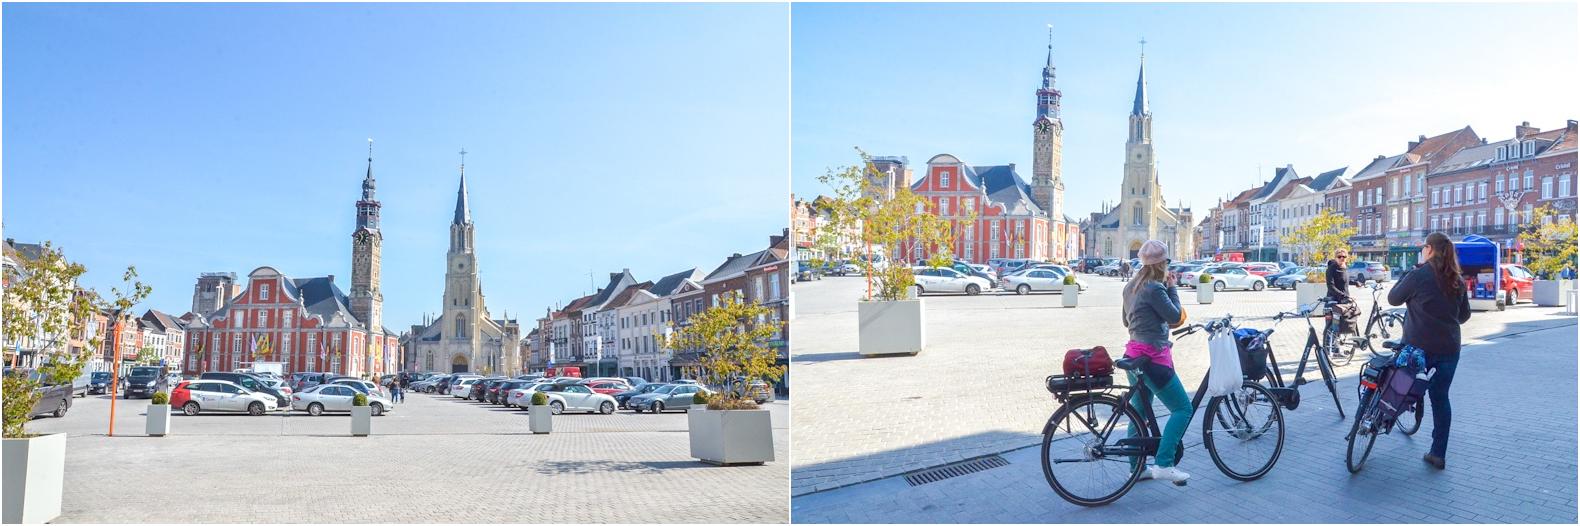 Sint-Truidencollage6.jpg